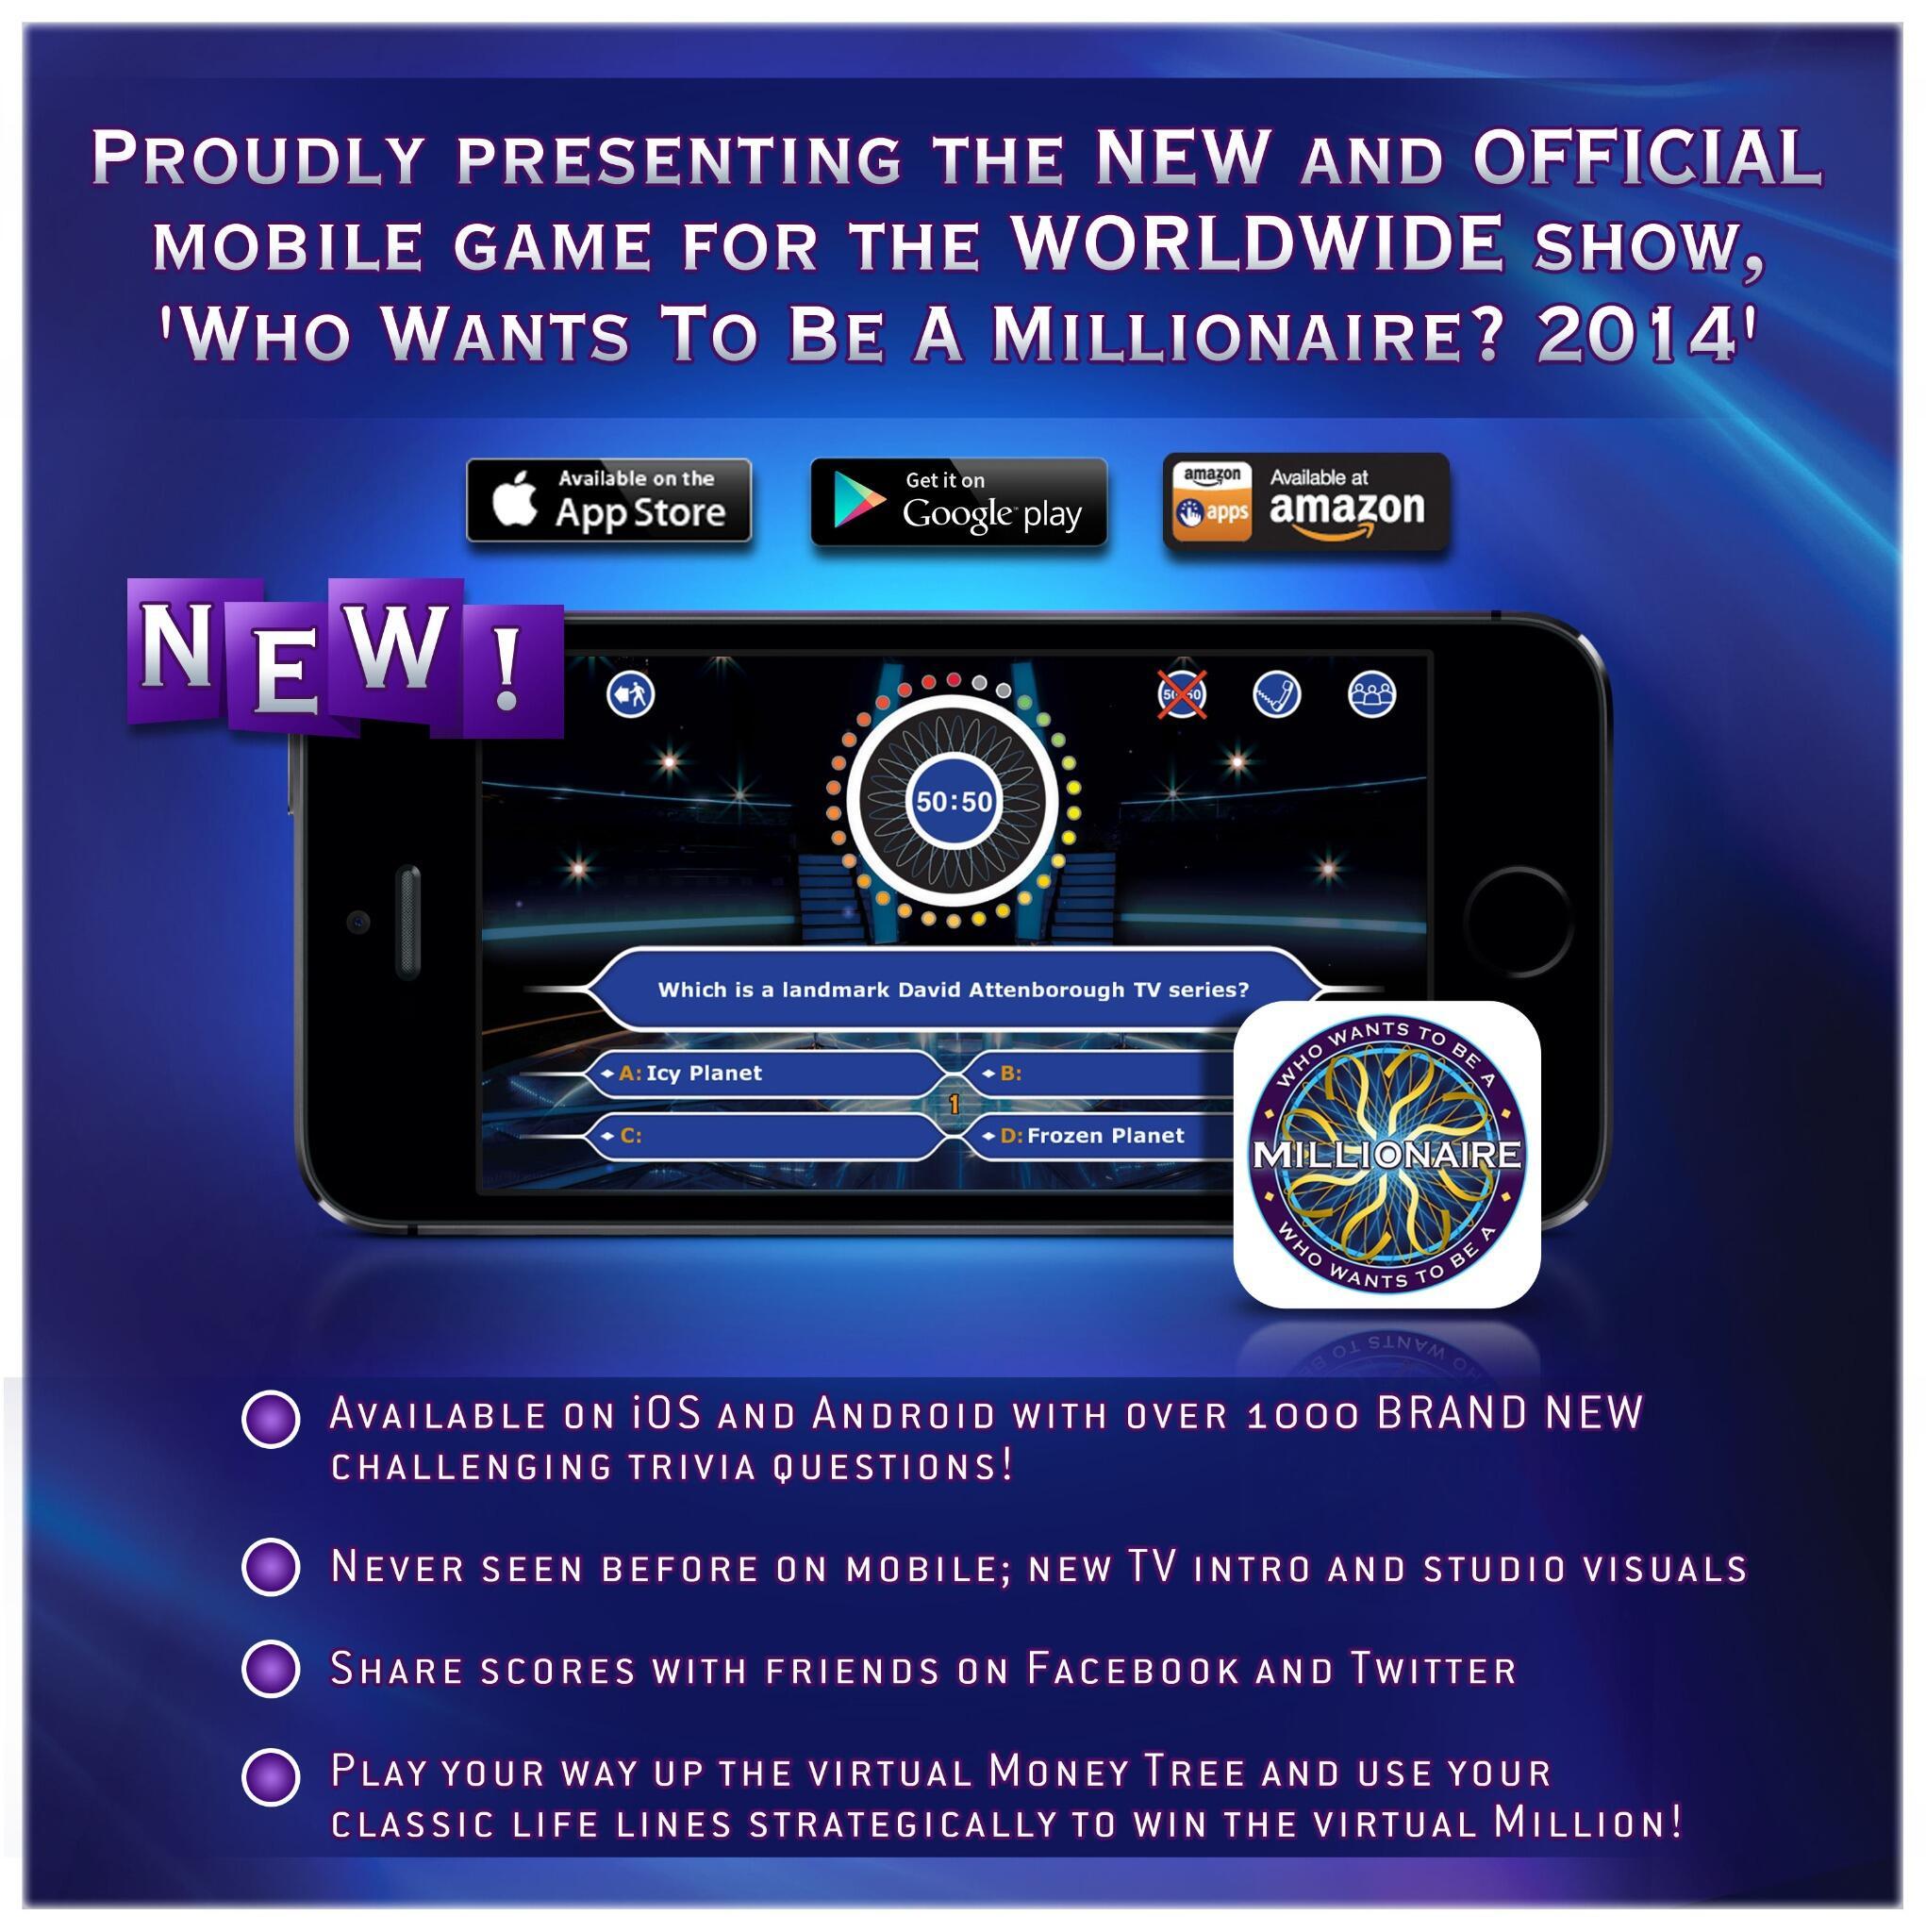 Millionaire brand